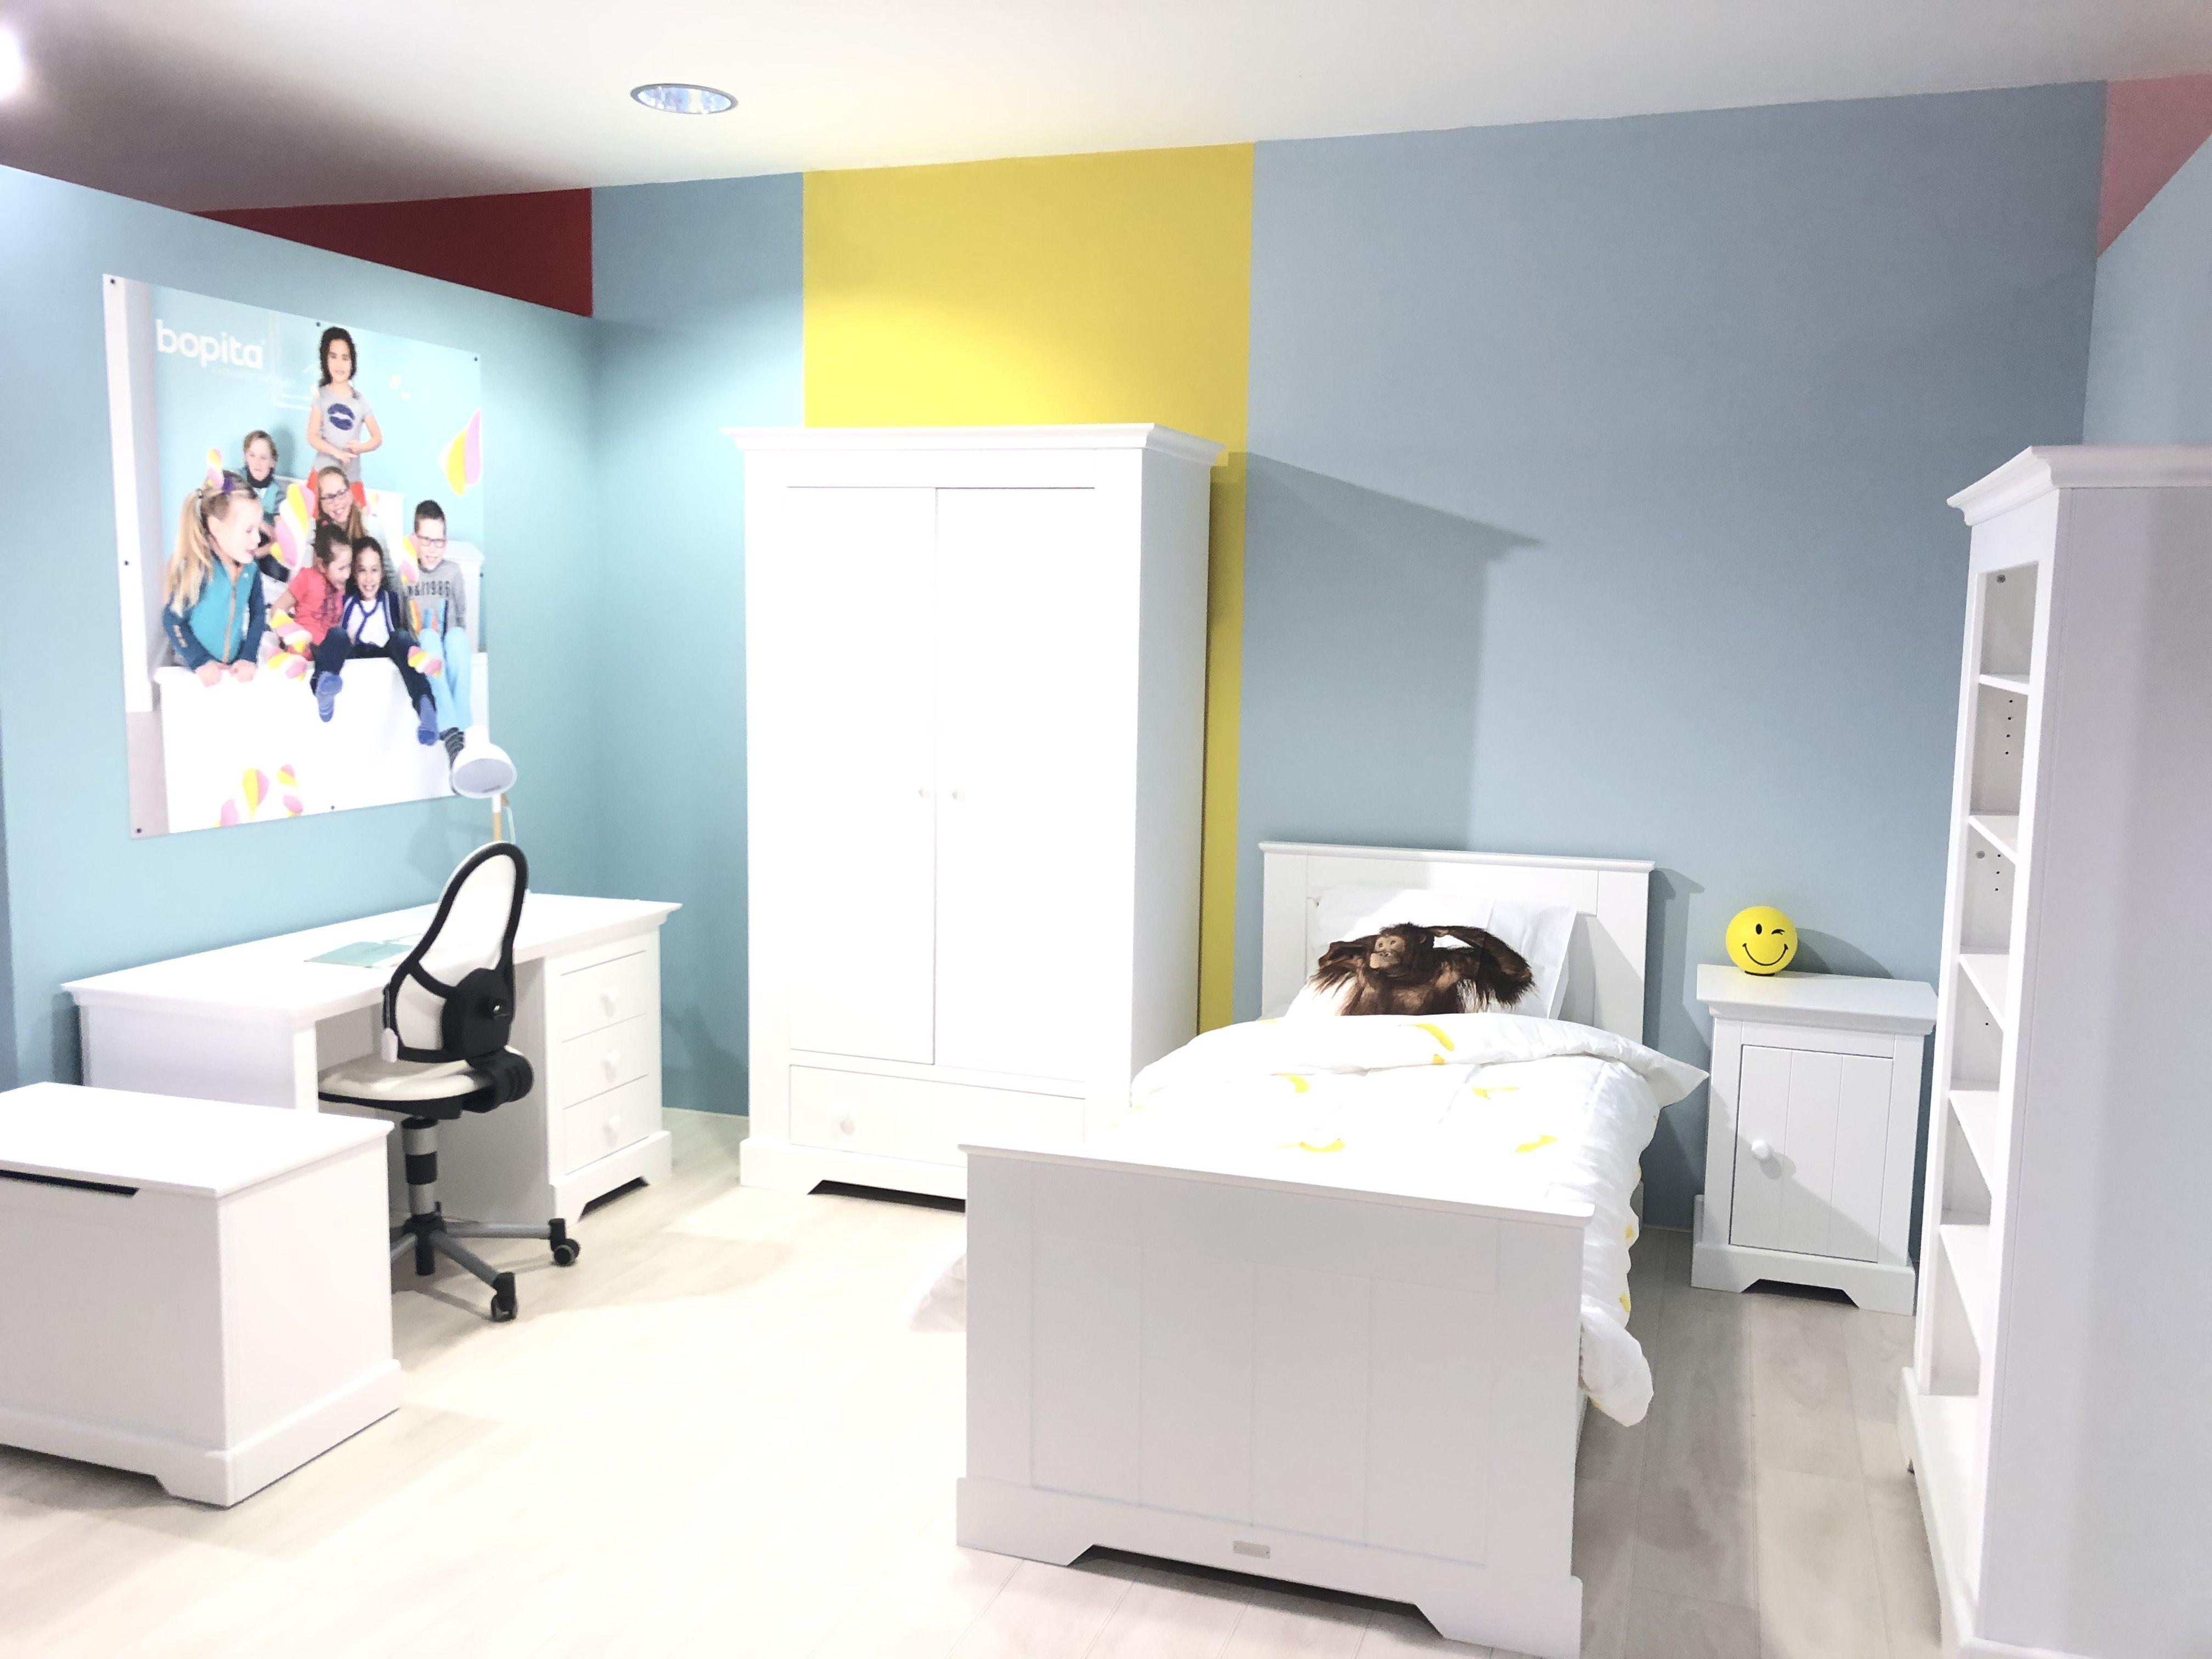 Kinderkamer Narbonne Van Bopita De Boomhut Bopita